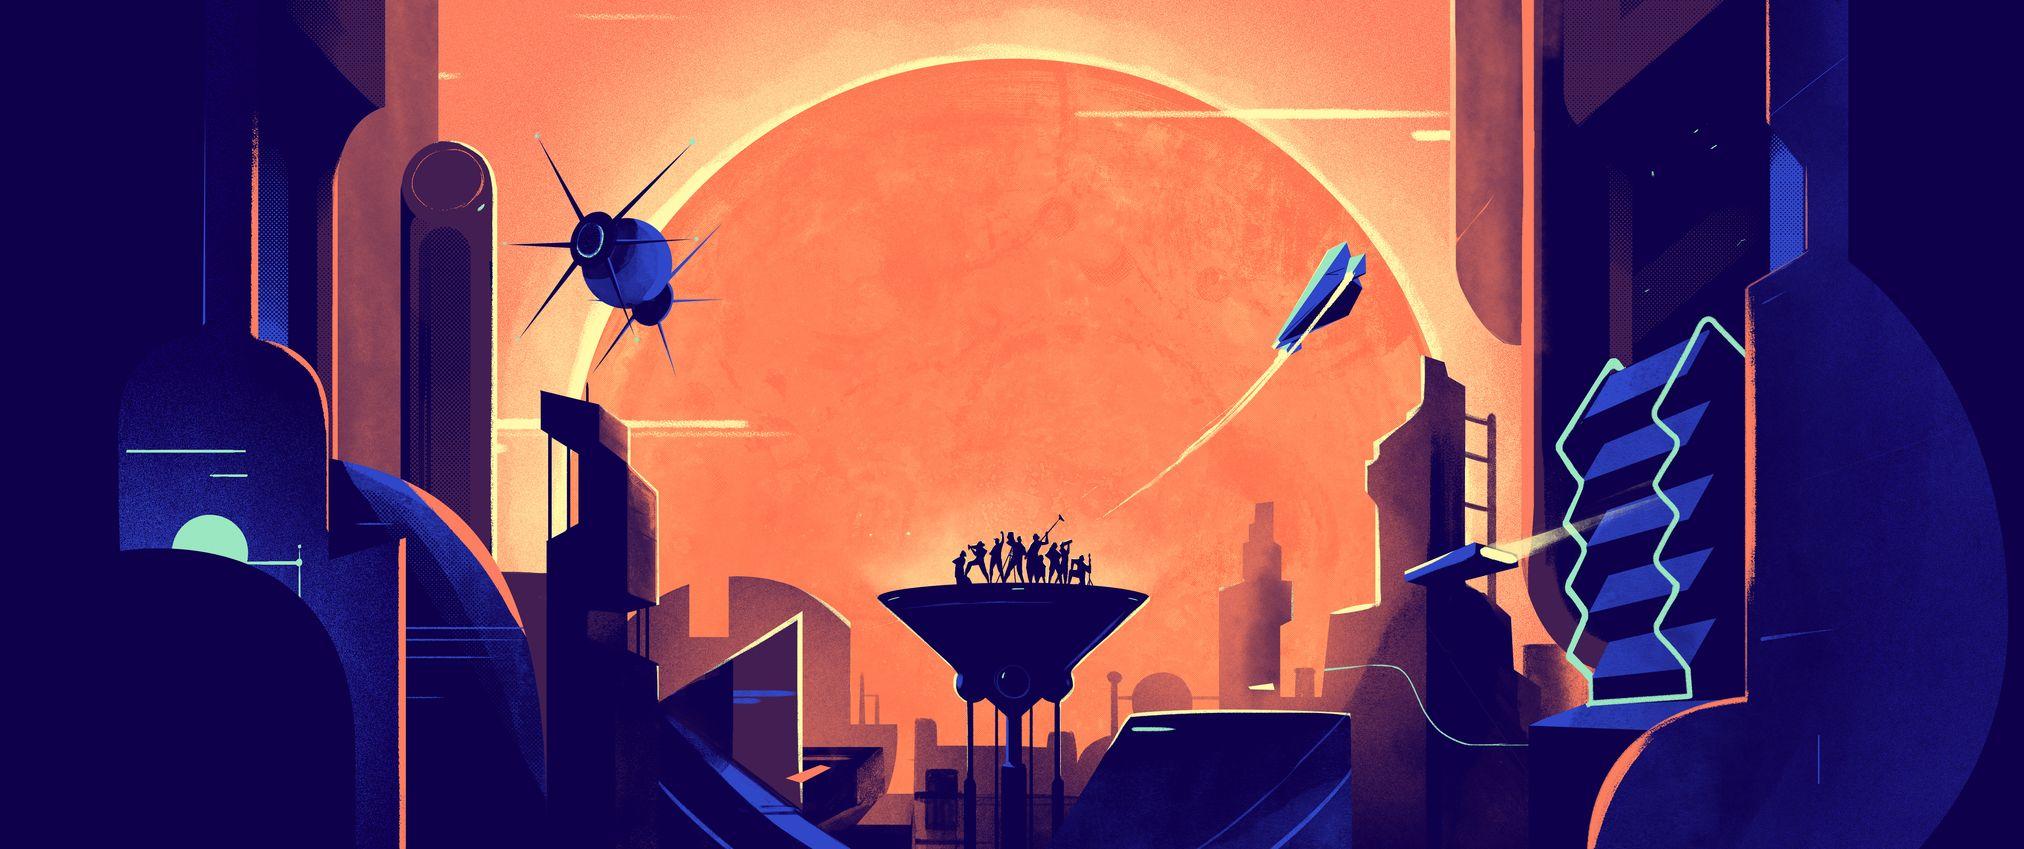 garance-illustration-Leonard-Dupond-Being-Human-Is-huge-moon-and-title